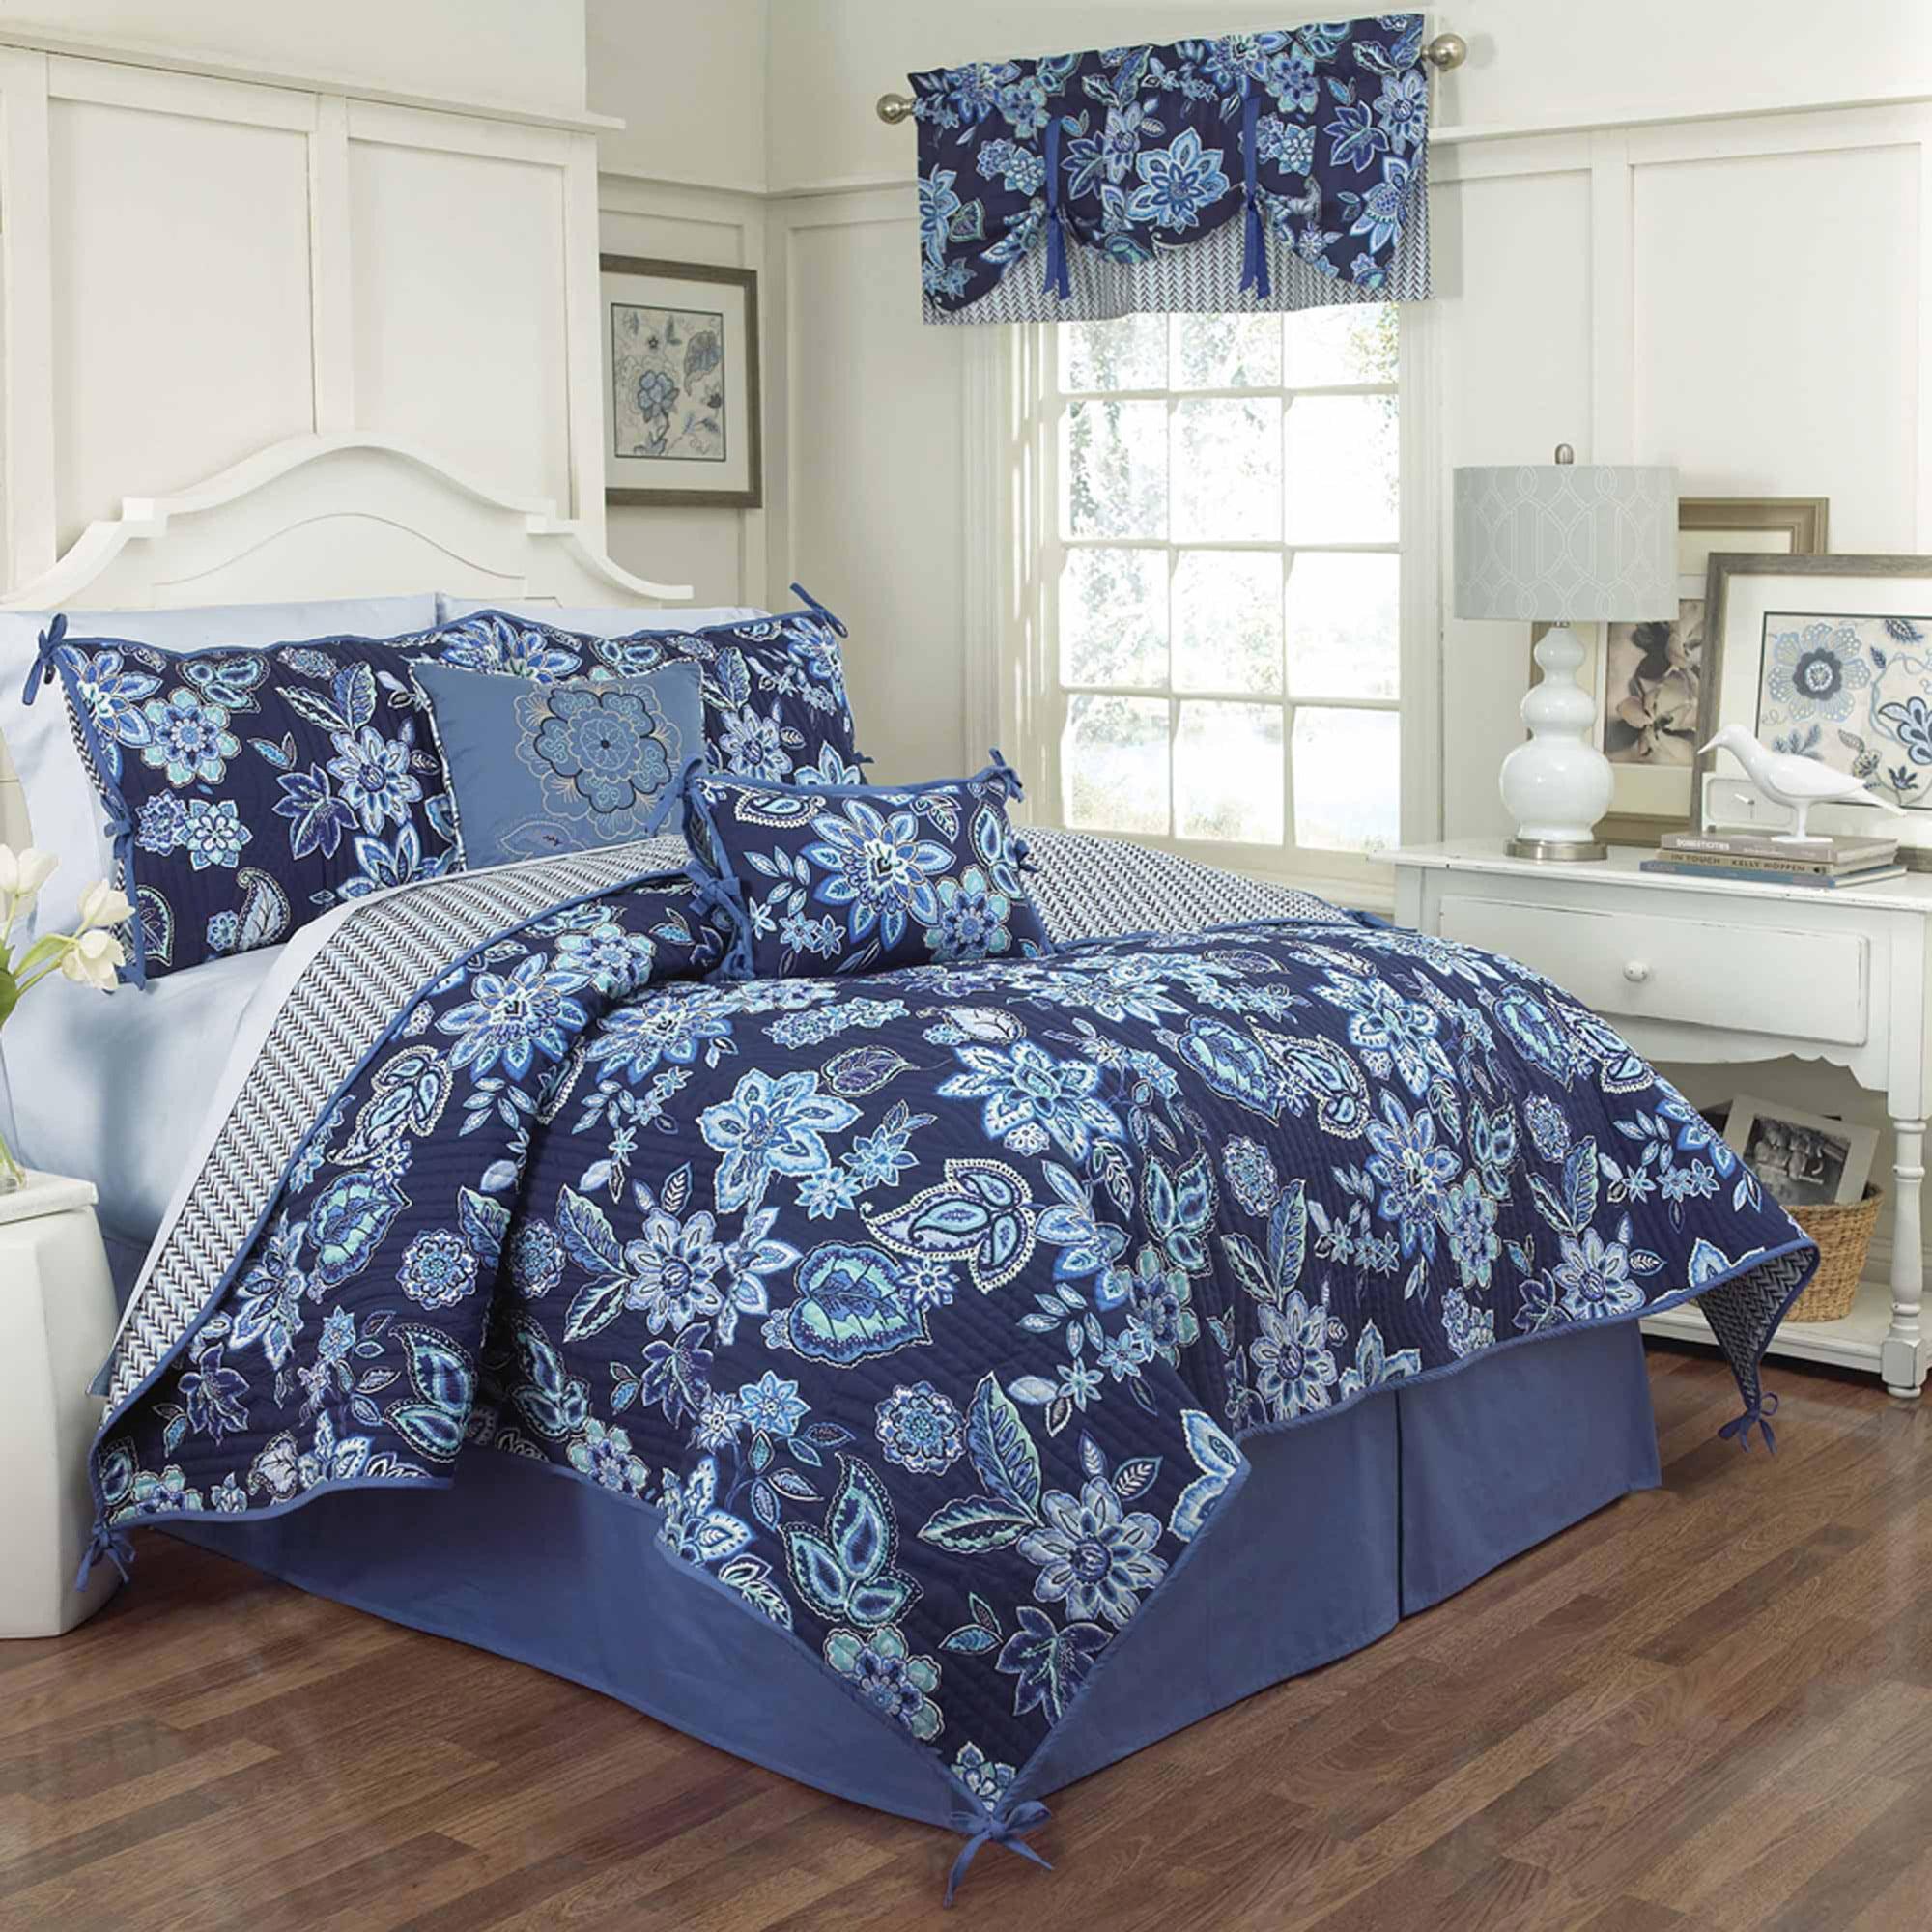 waverly charismatic reversible quilt set walmartcom - Waverly Bedding